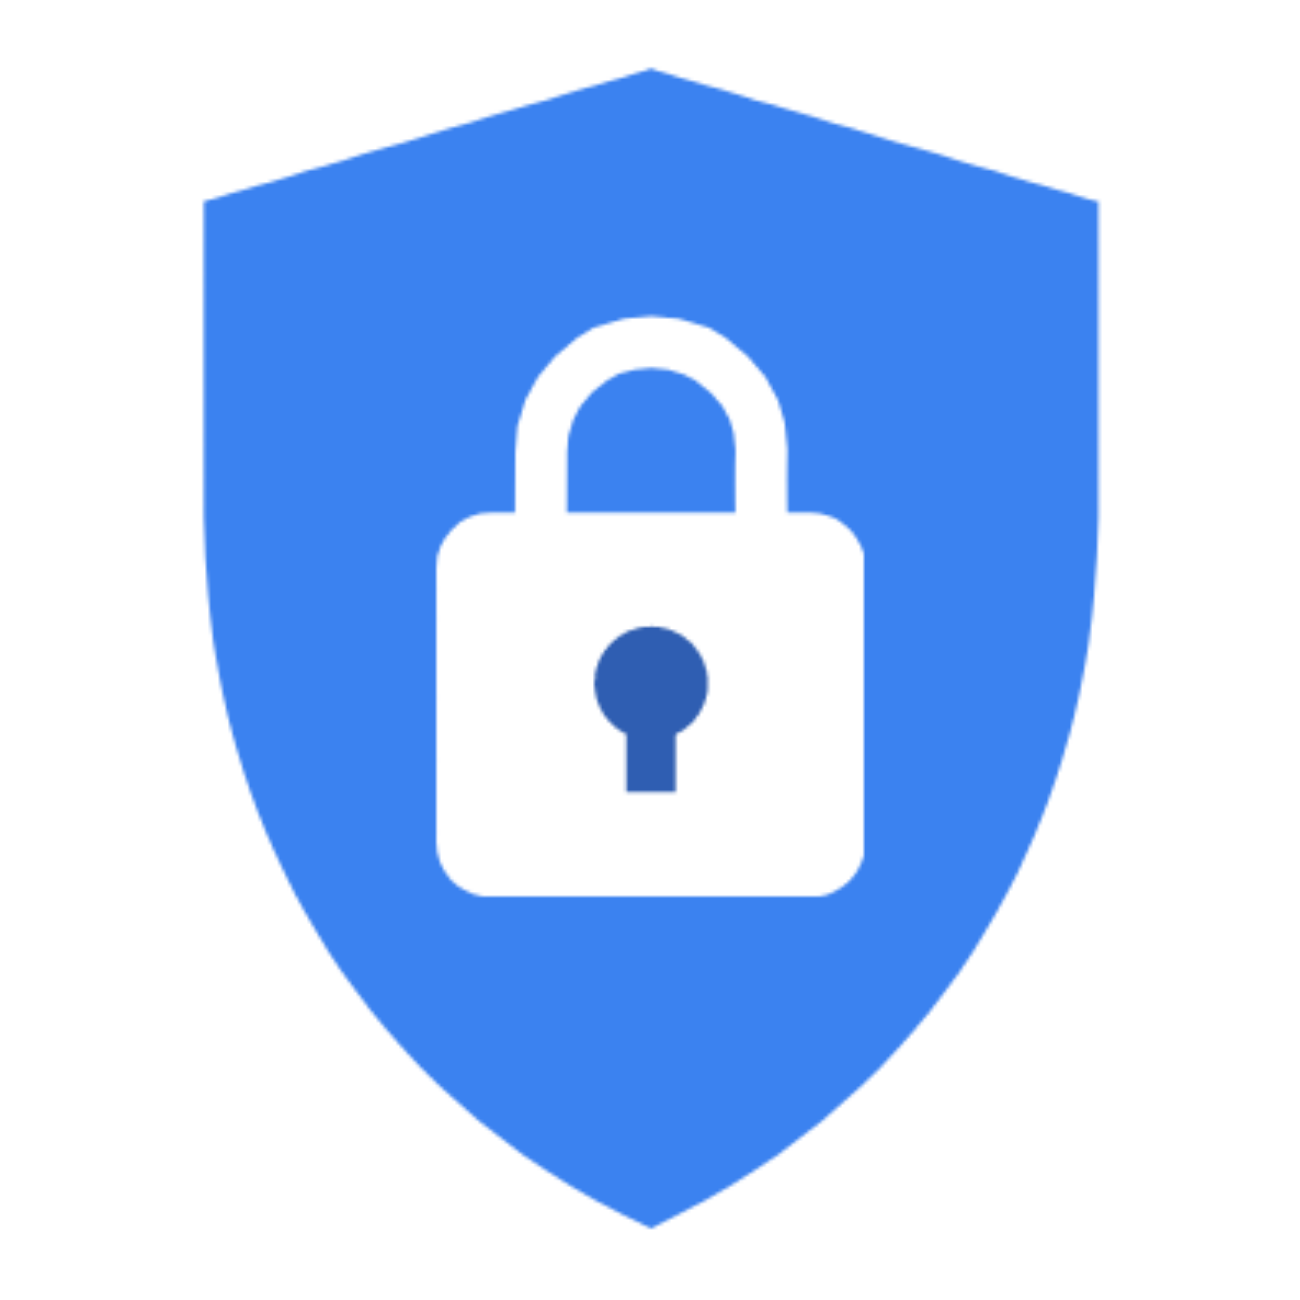 sq - secure